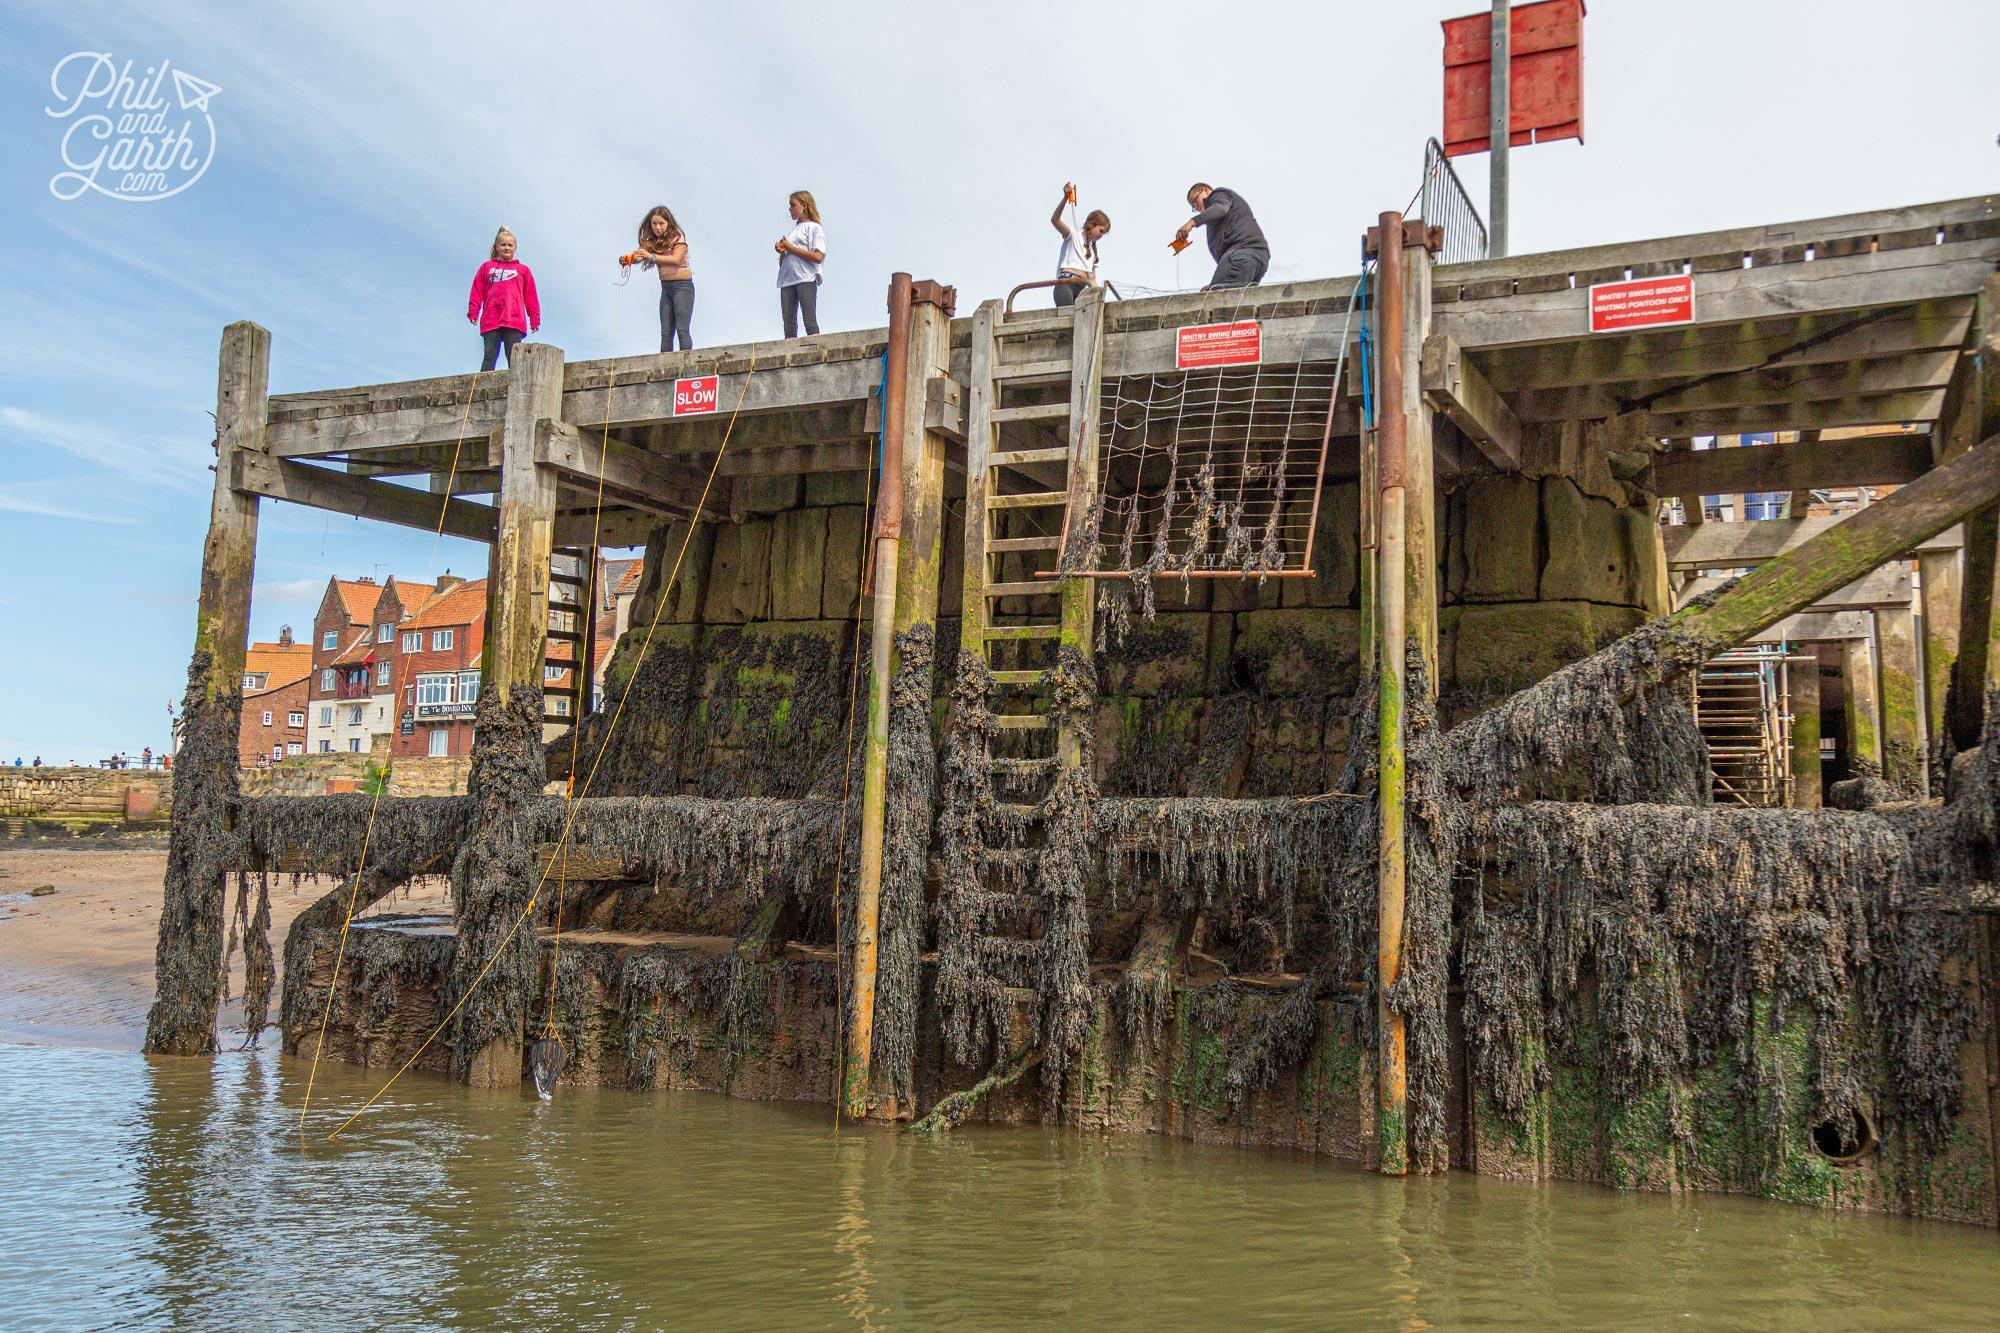 Children crabbing in Whitby Harbour